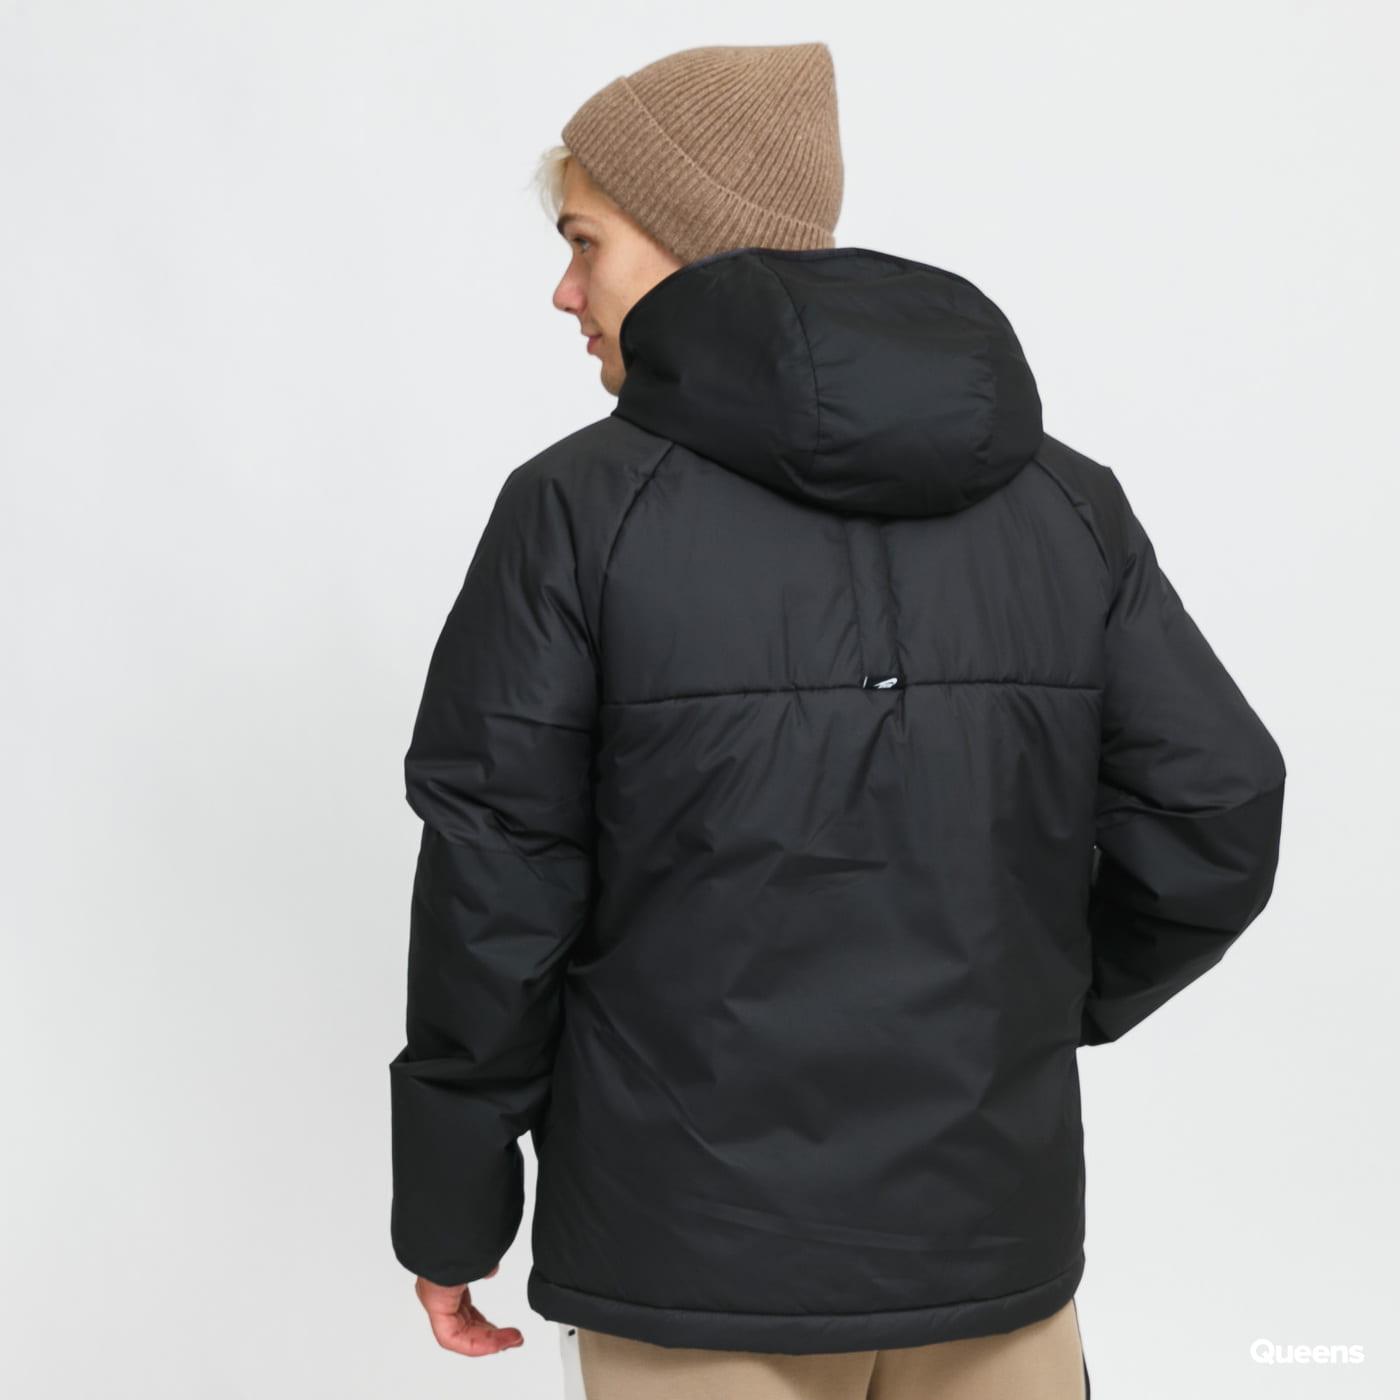 Nike M NSW Therma-FIT Legacy Jacket gray / beige / pink / black